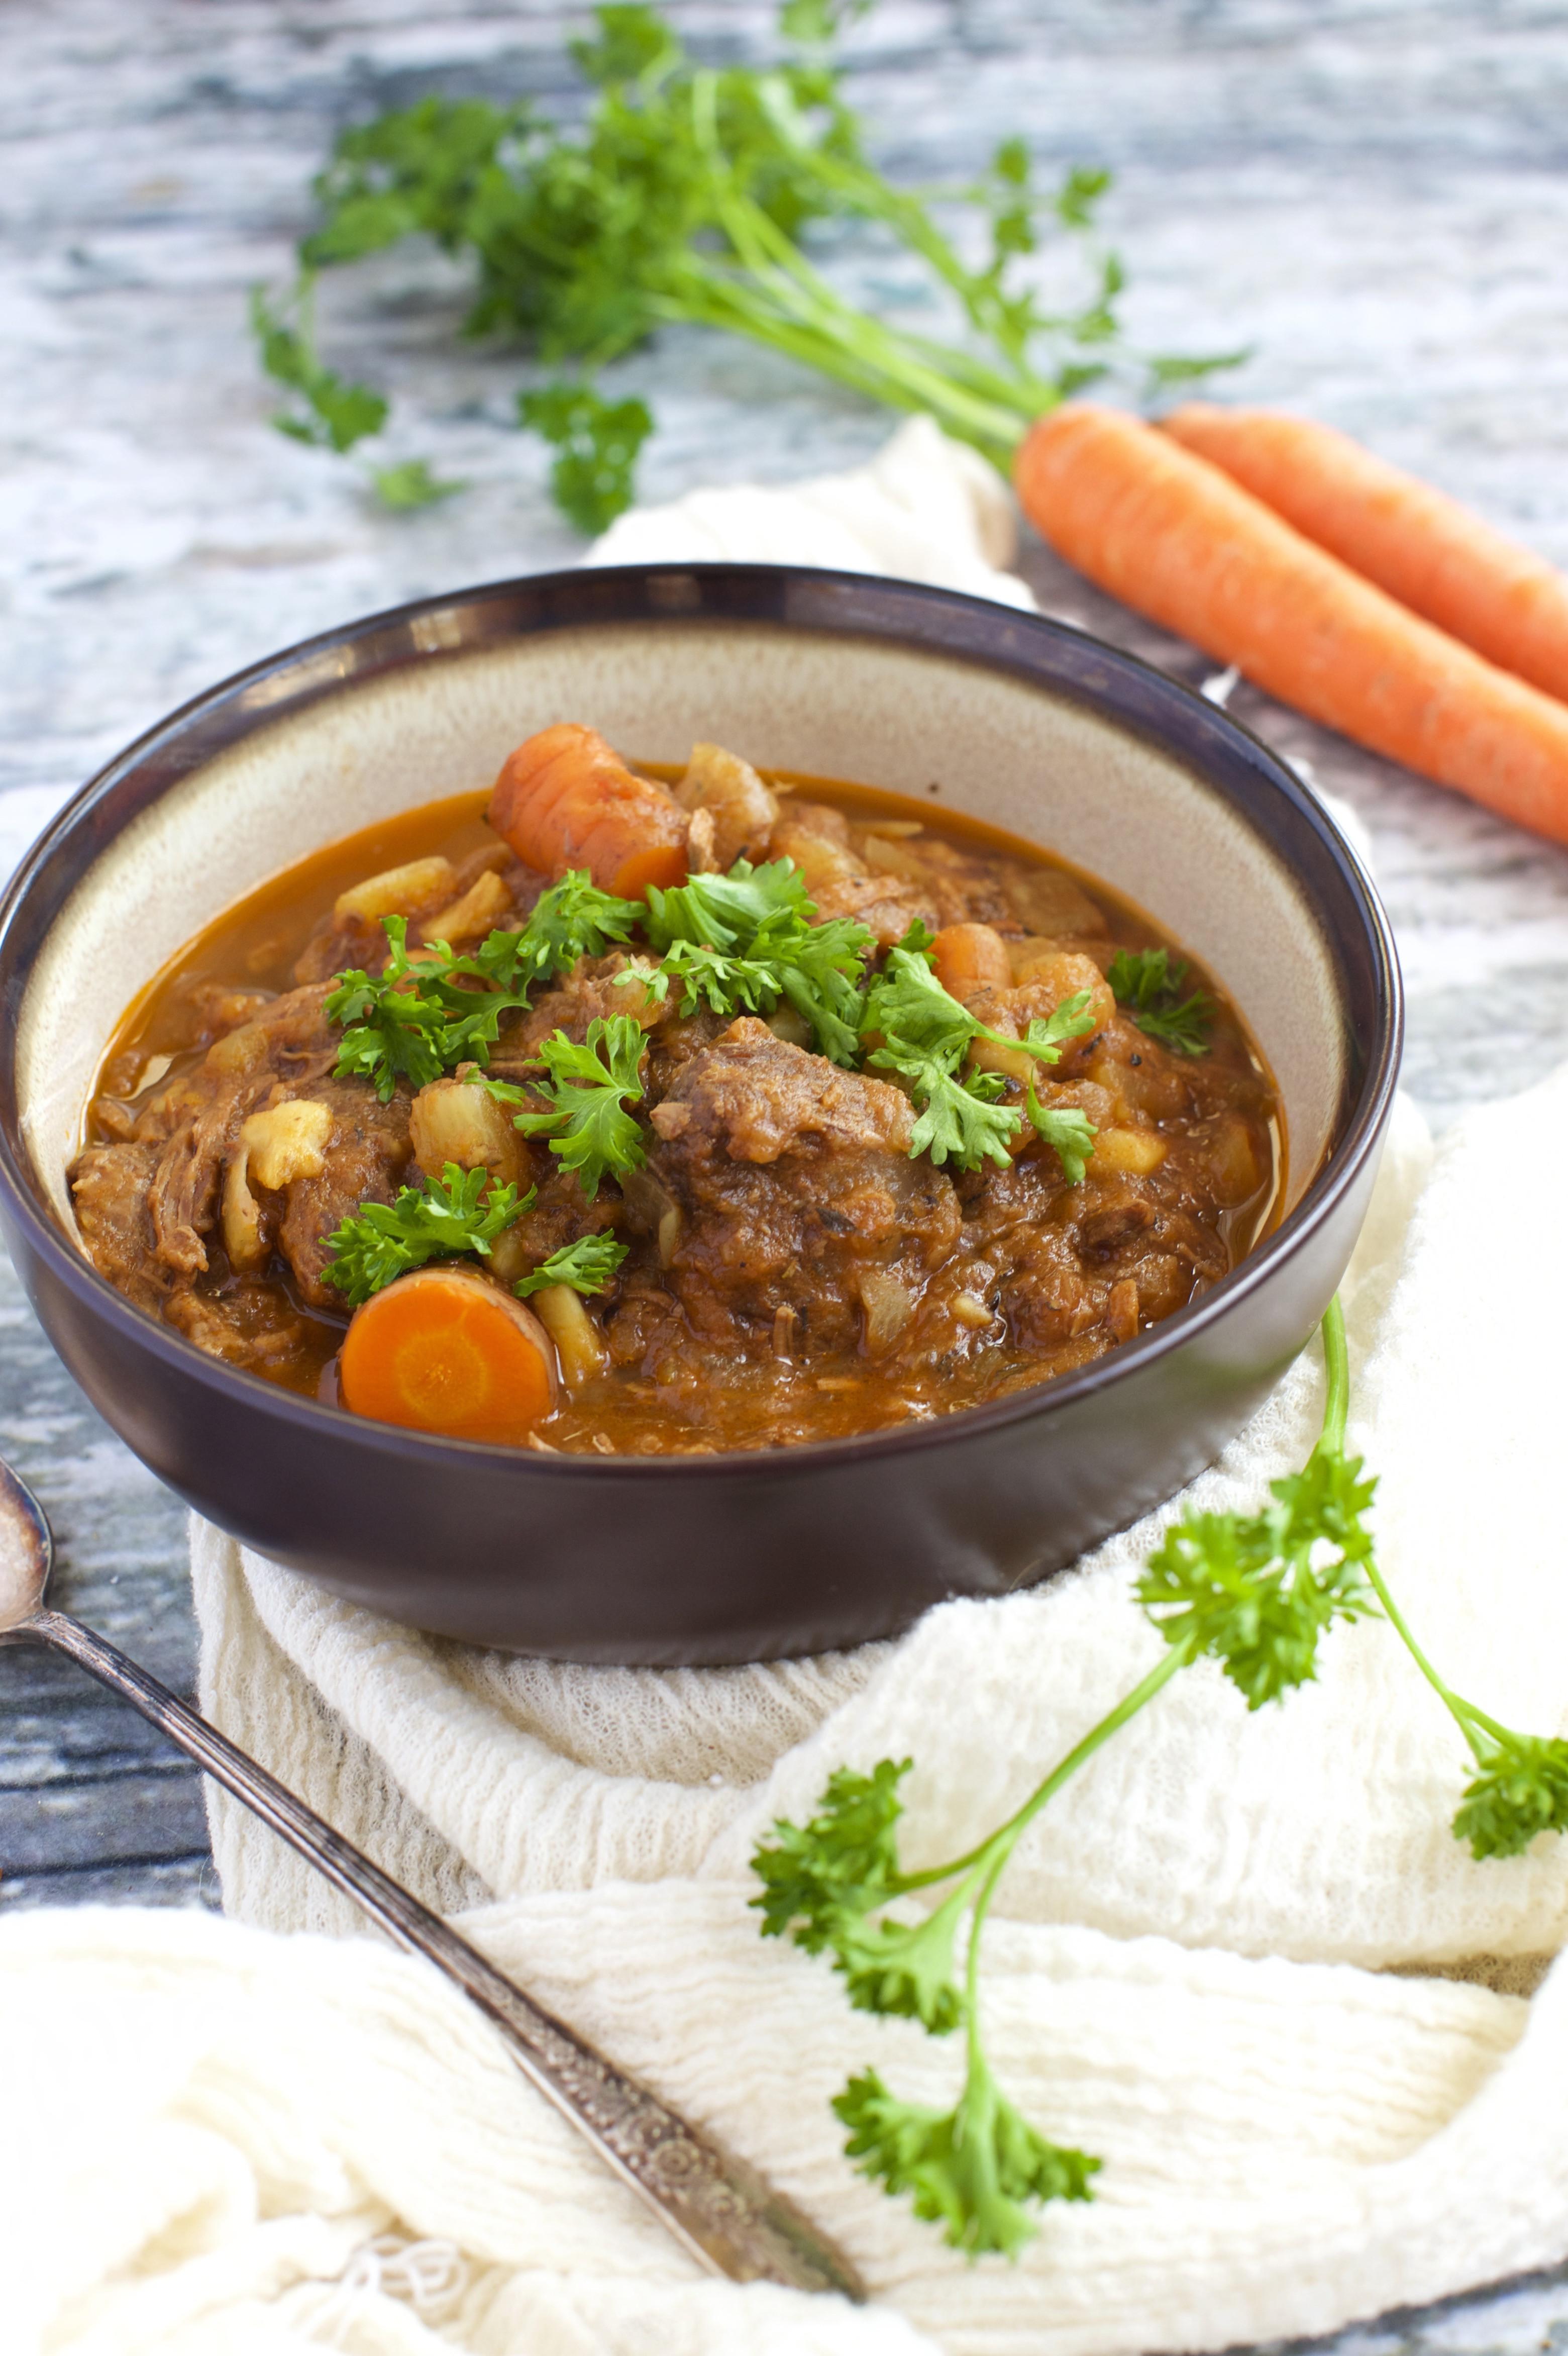 Irish Stew Slow Cooker  Paleo Slow Cooker Irish Stew Recipe Simply So Healthy